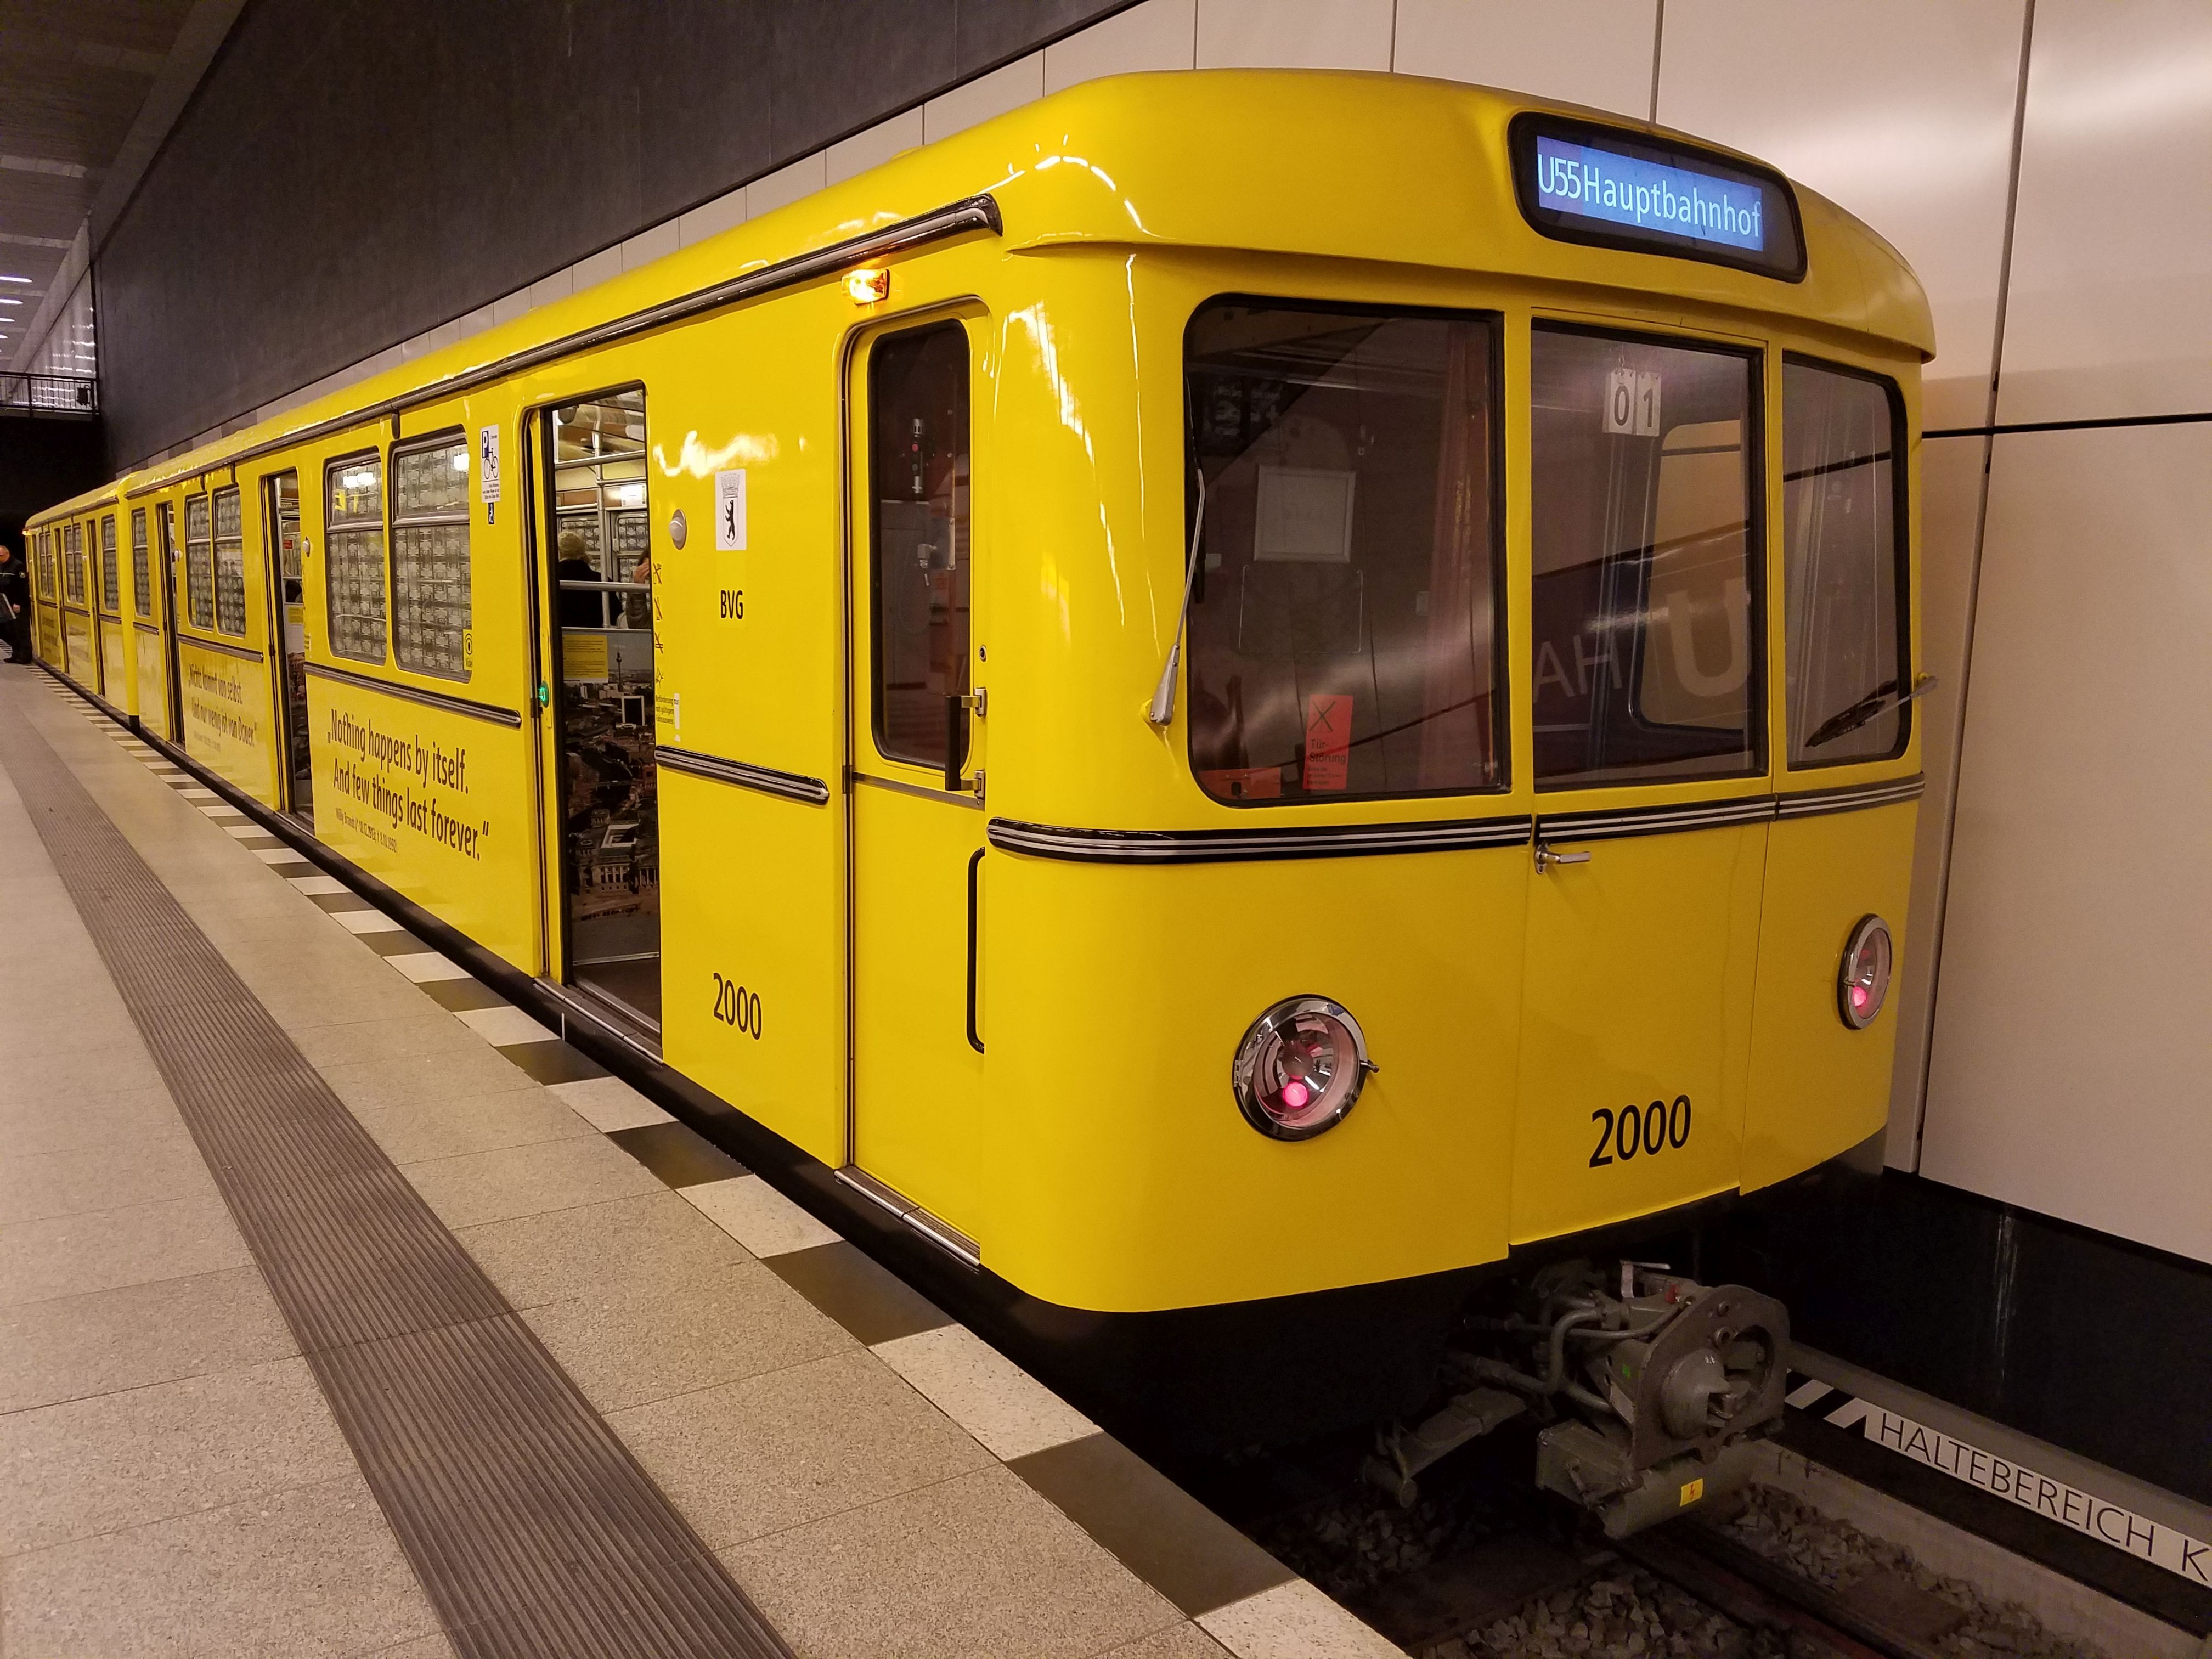 U-Bahn 2000, Baureihe D, Berlin Hbf, Januar 2018